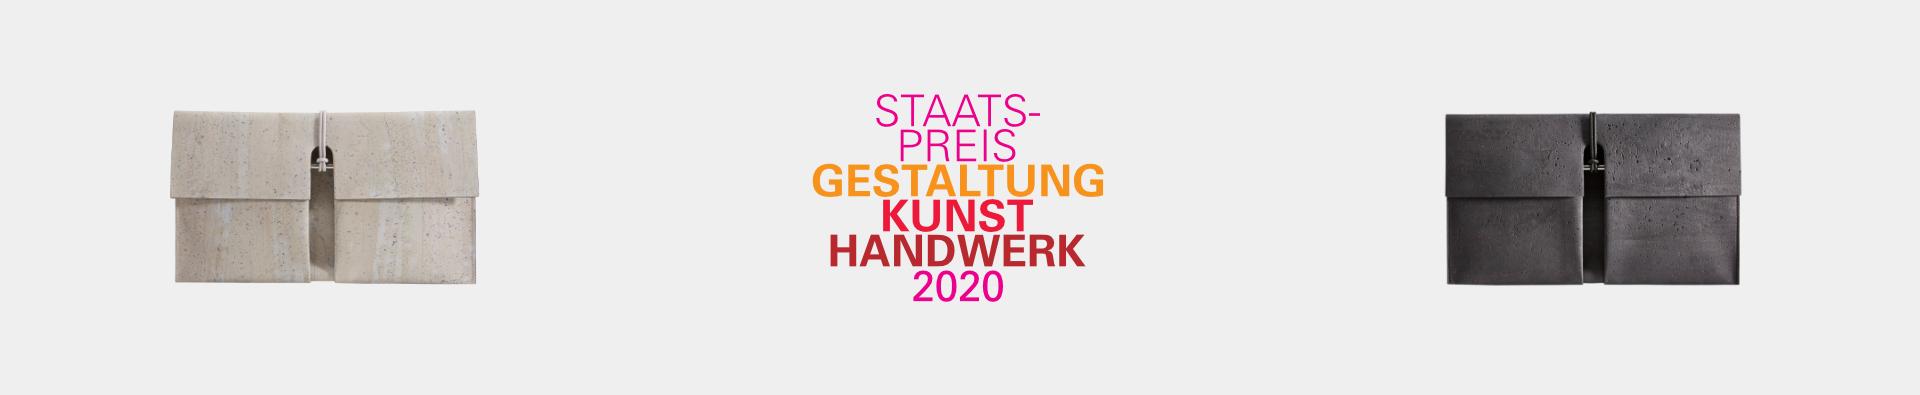 burggrafburggraf-staatspreis-gestaltung-kunst-handwerk-2020